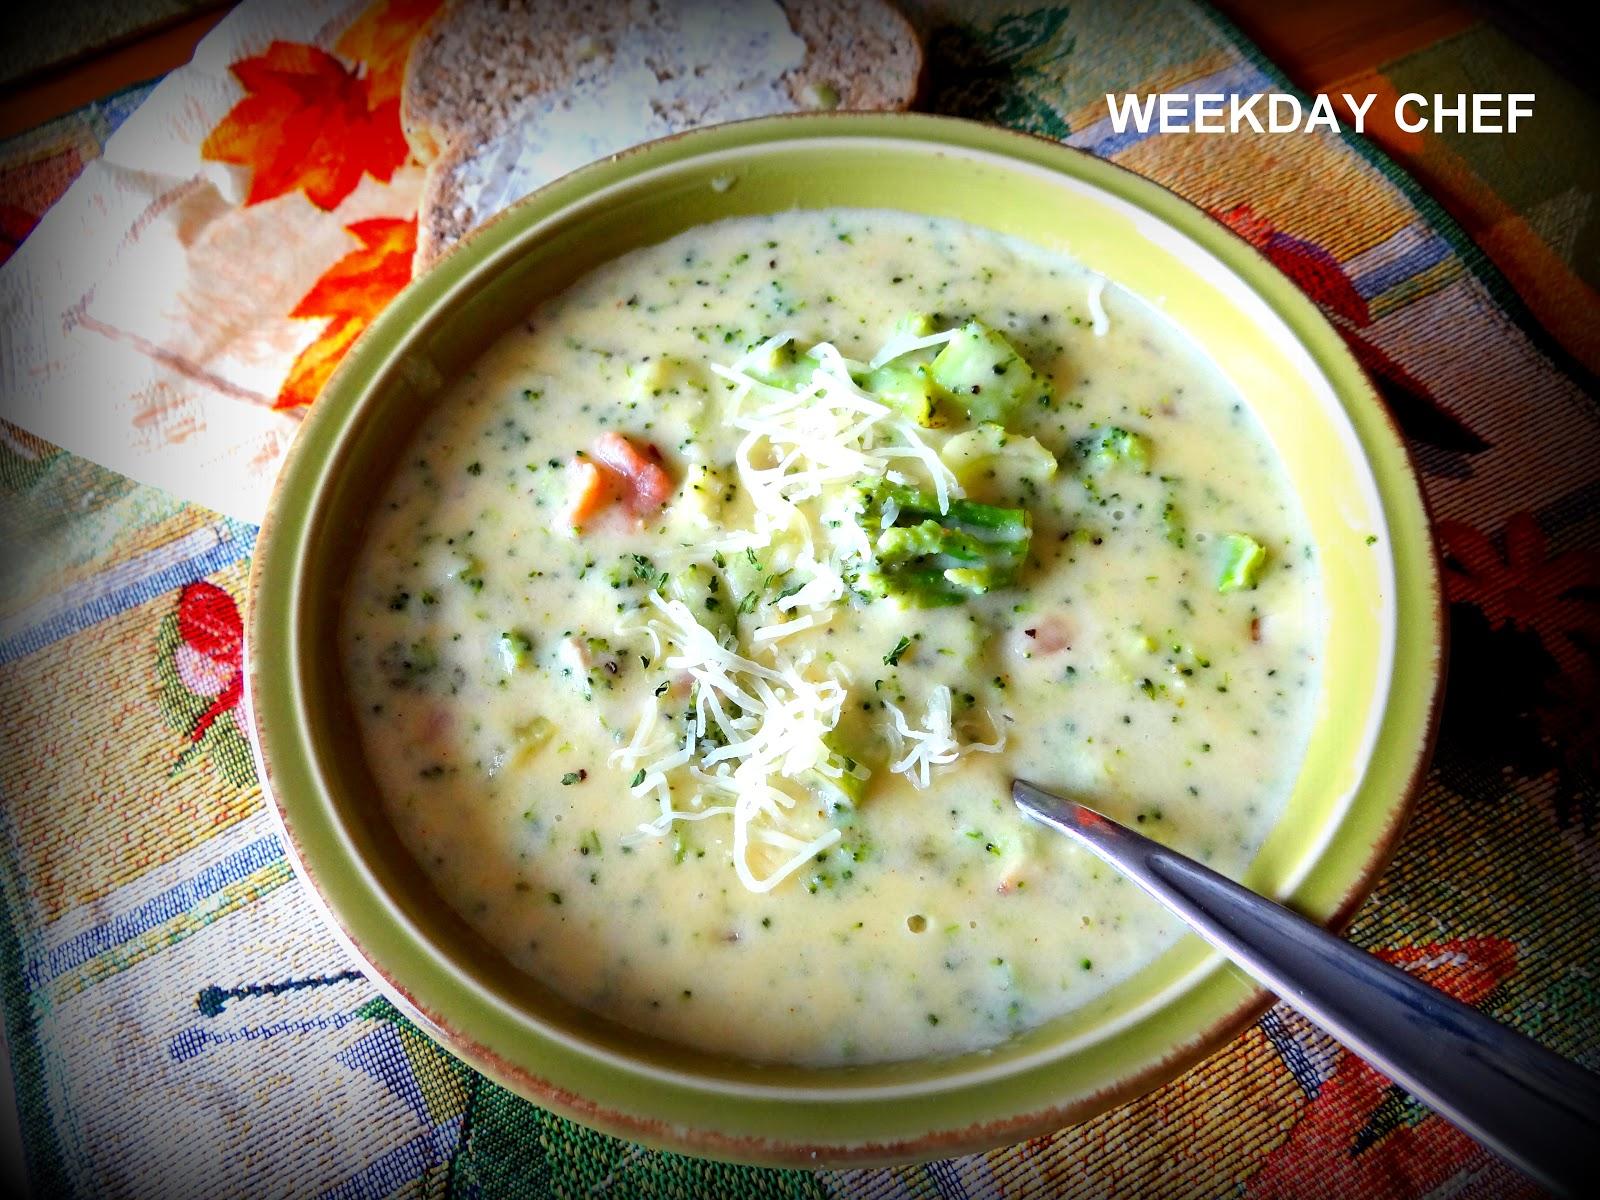 Weekday Chef: Cream of Broccoli Soup like Kneaders